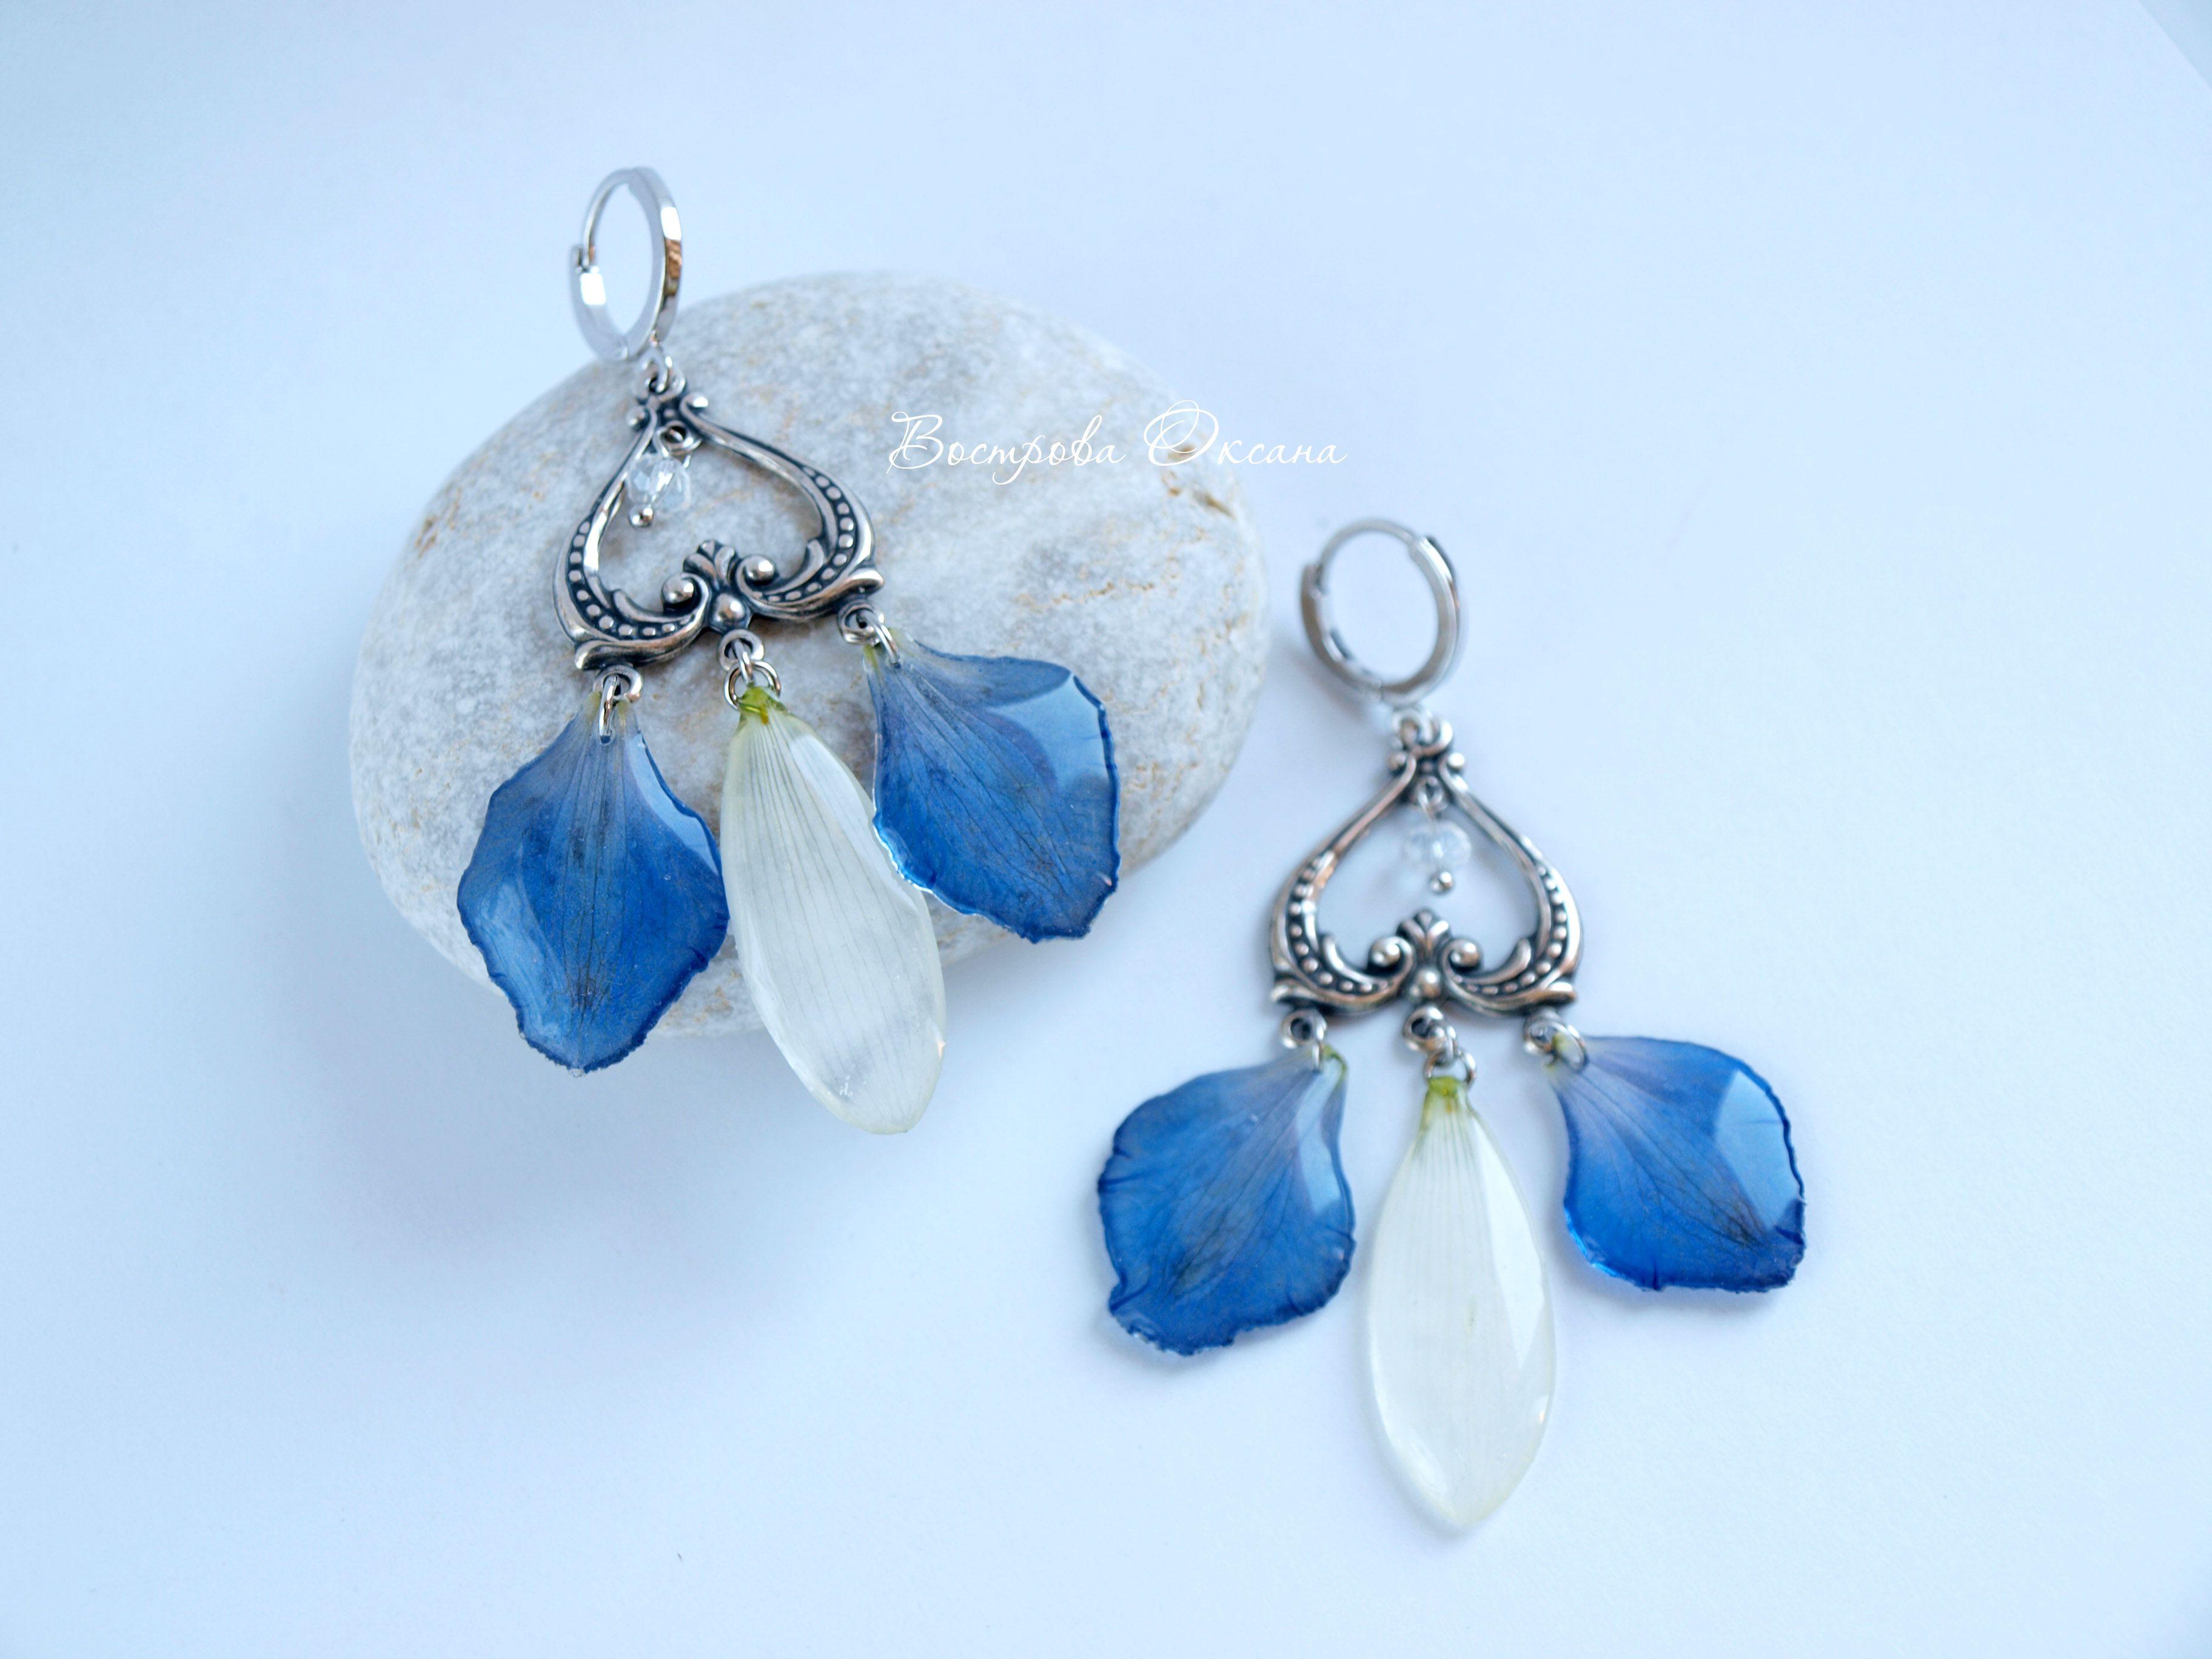 petals eardrops gift chrysanthemum jewelry handmade